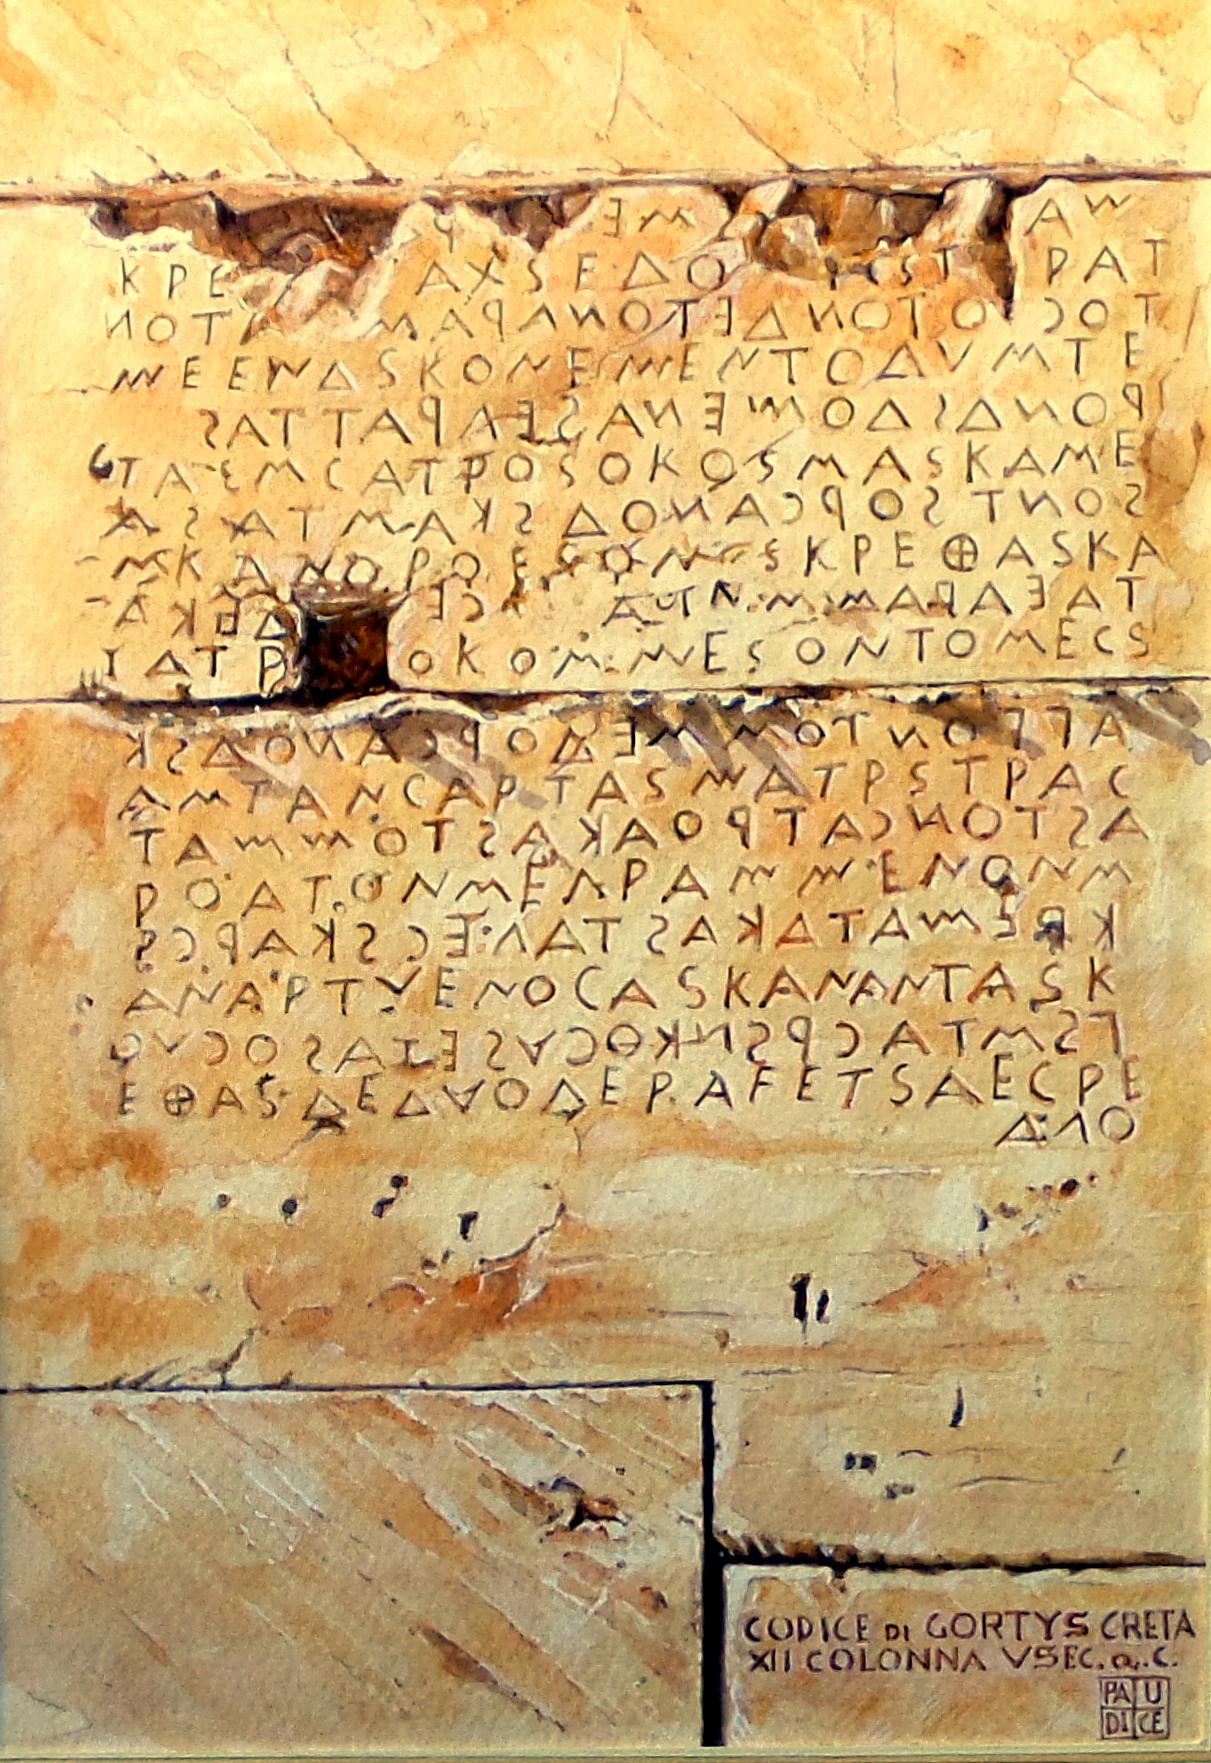 Vincenzo Paudice - Gortyna, Codice di Gortys